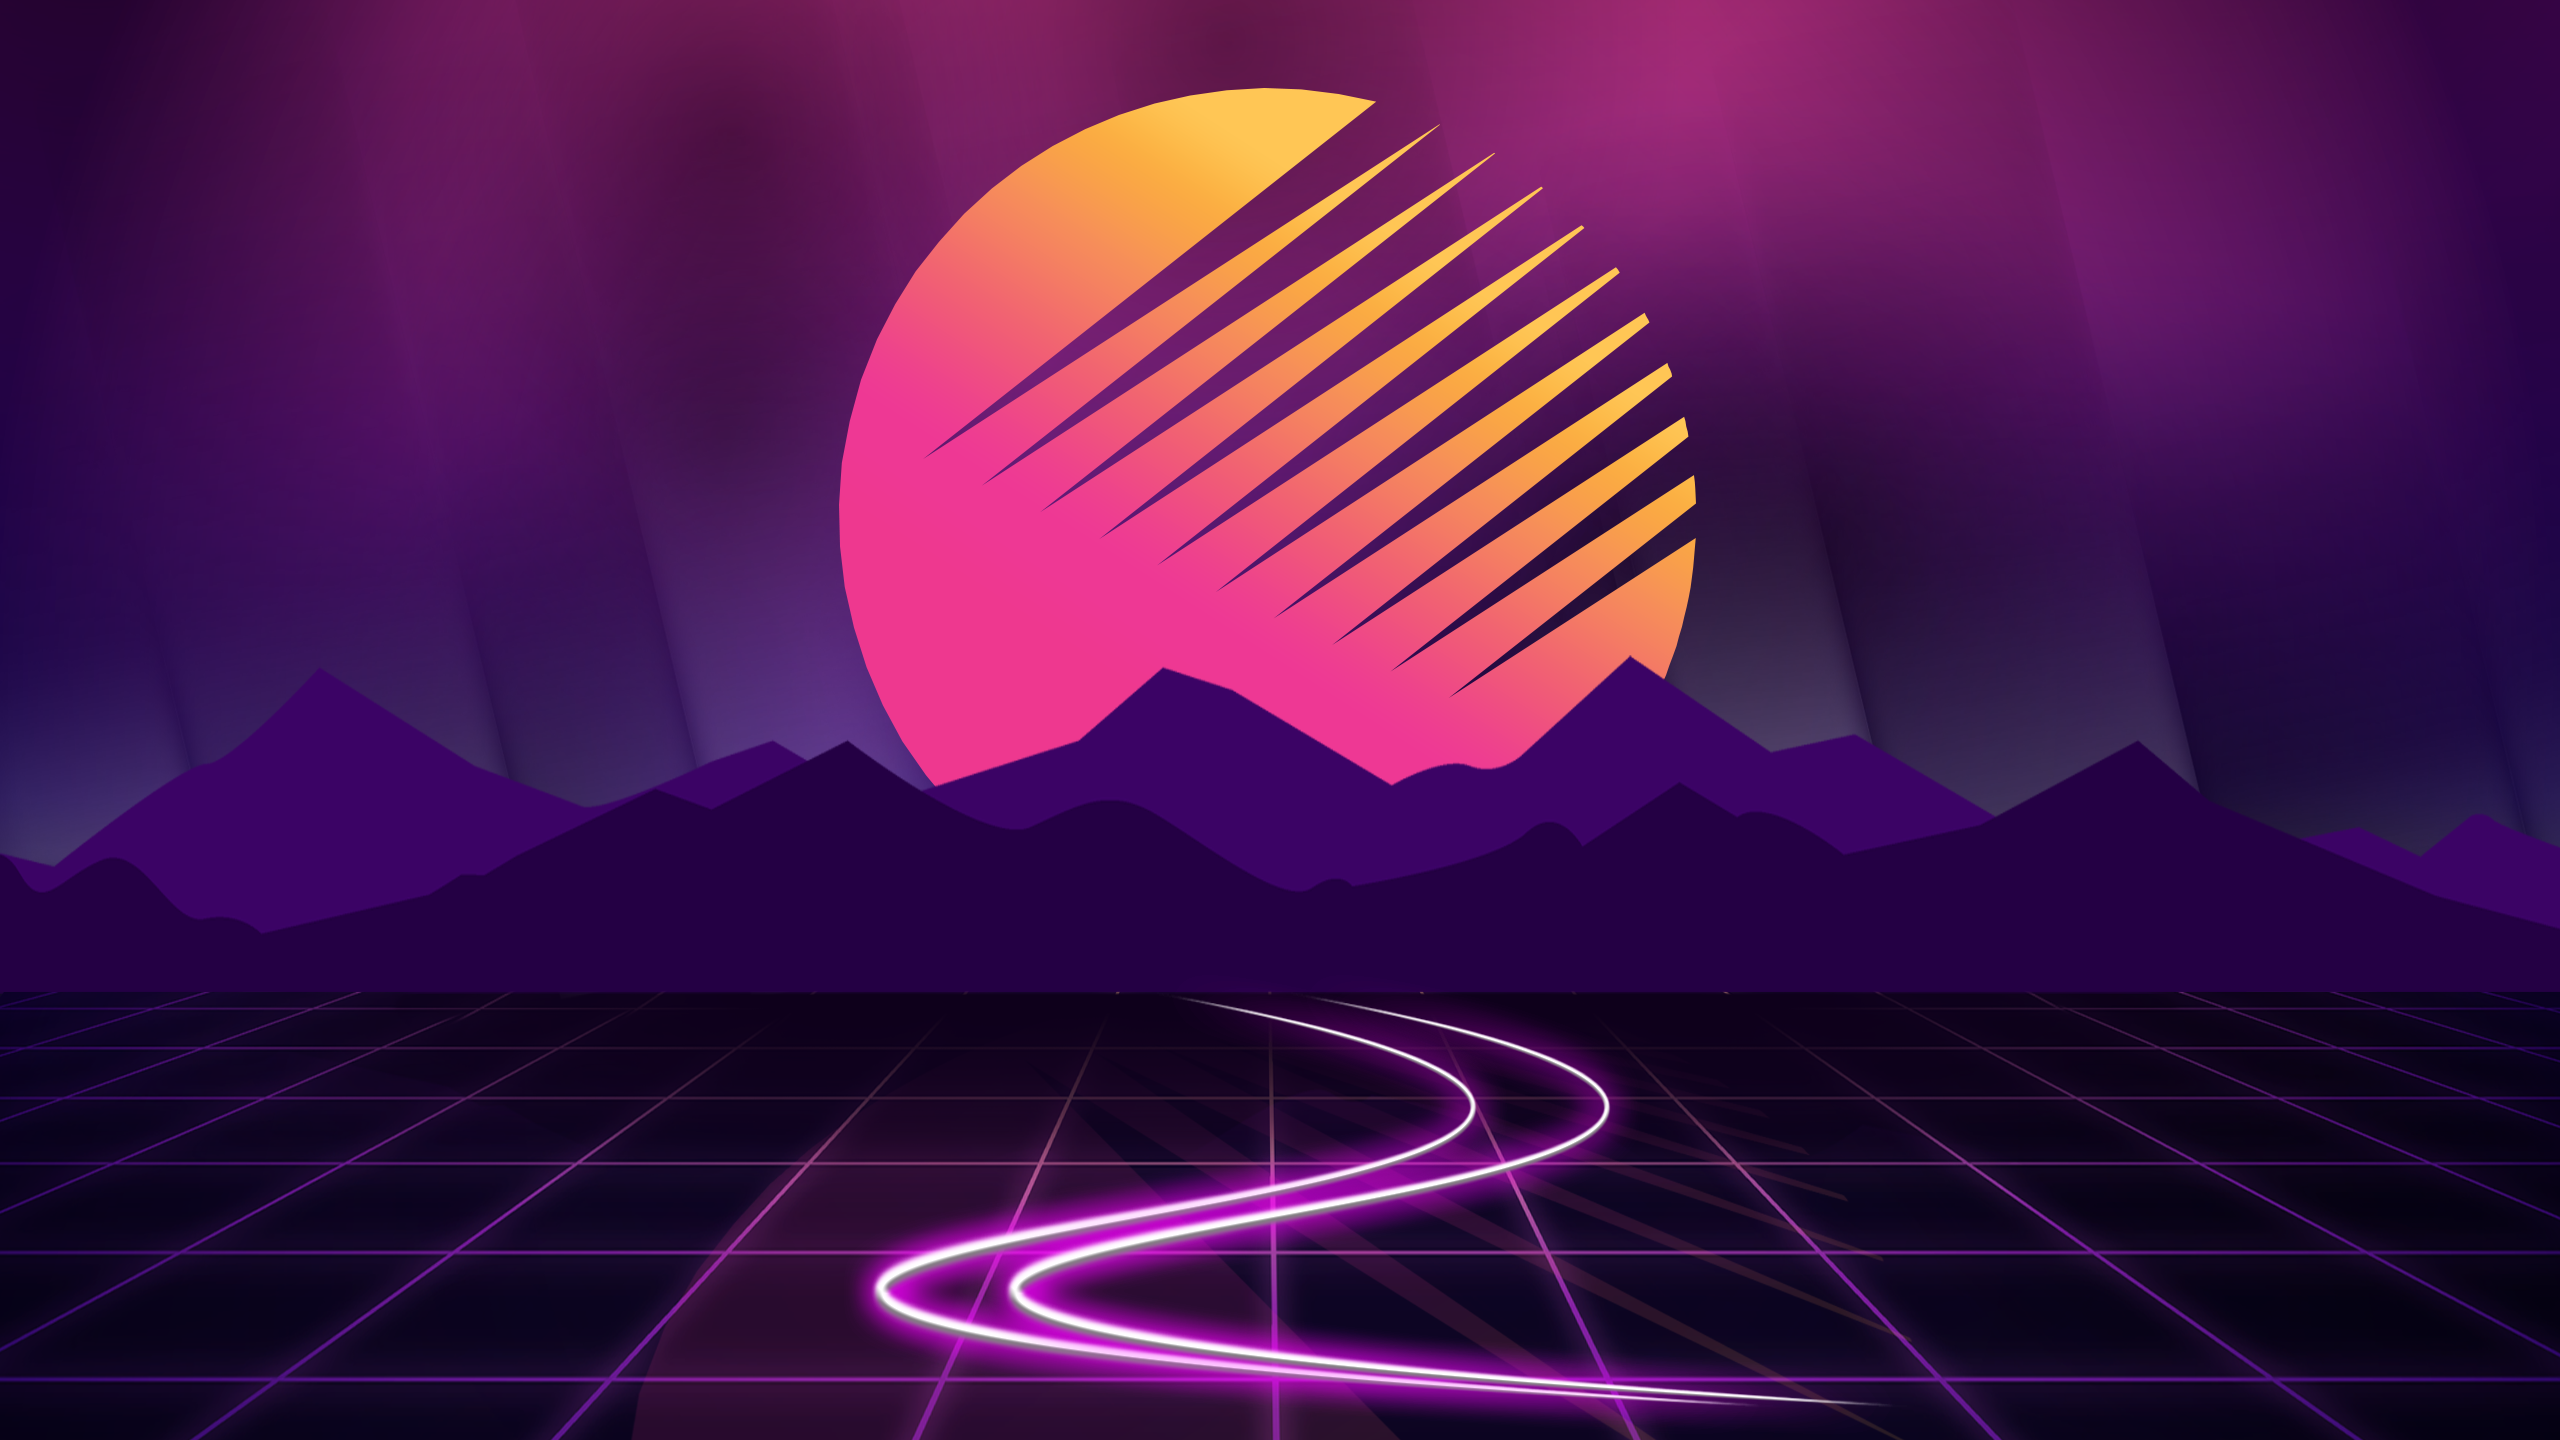 General 2560x1440 Retrowave retrowave vaporwave purple dark background